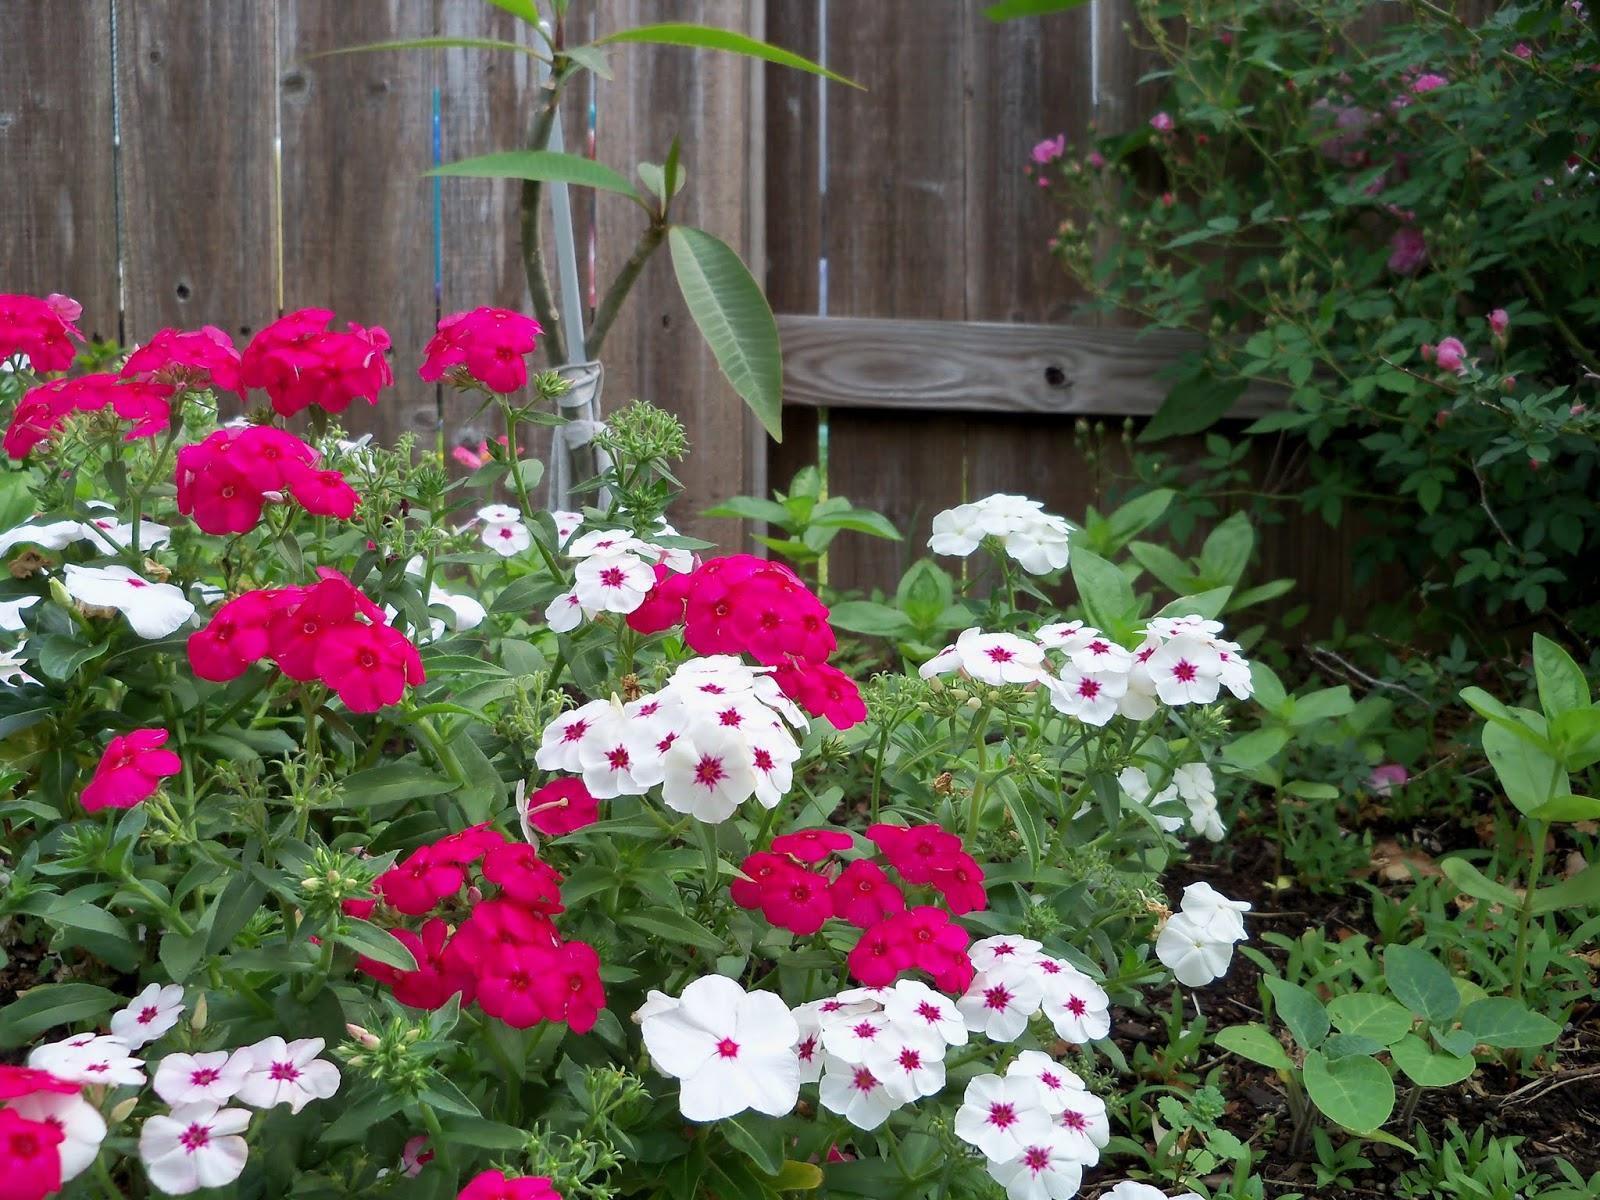 Gardening 2013 - 115_6011.JPG